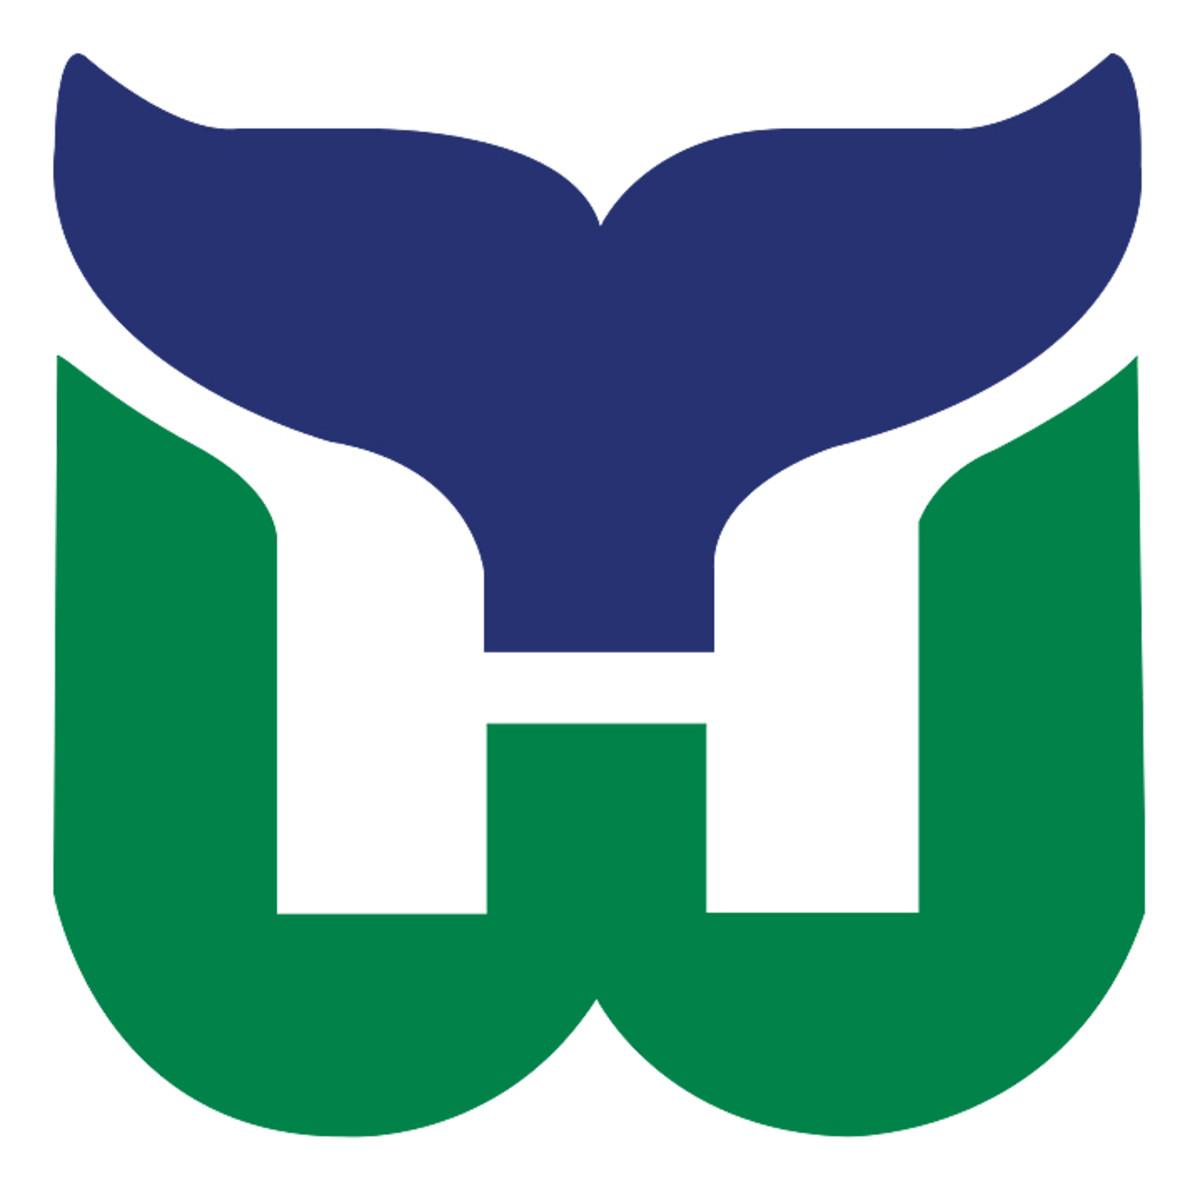 Hartford-Whalers-logo-1979-92_0.jpg